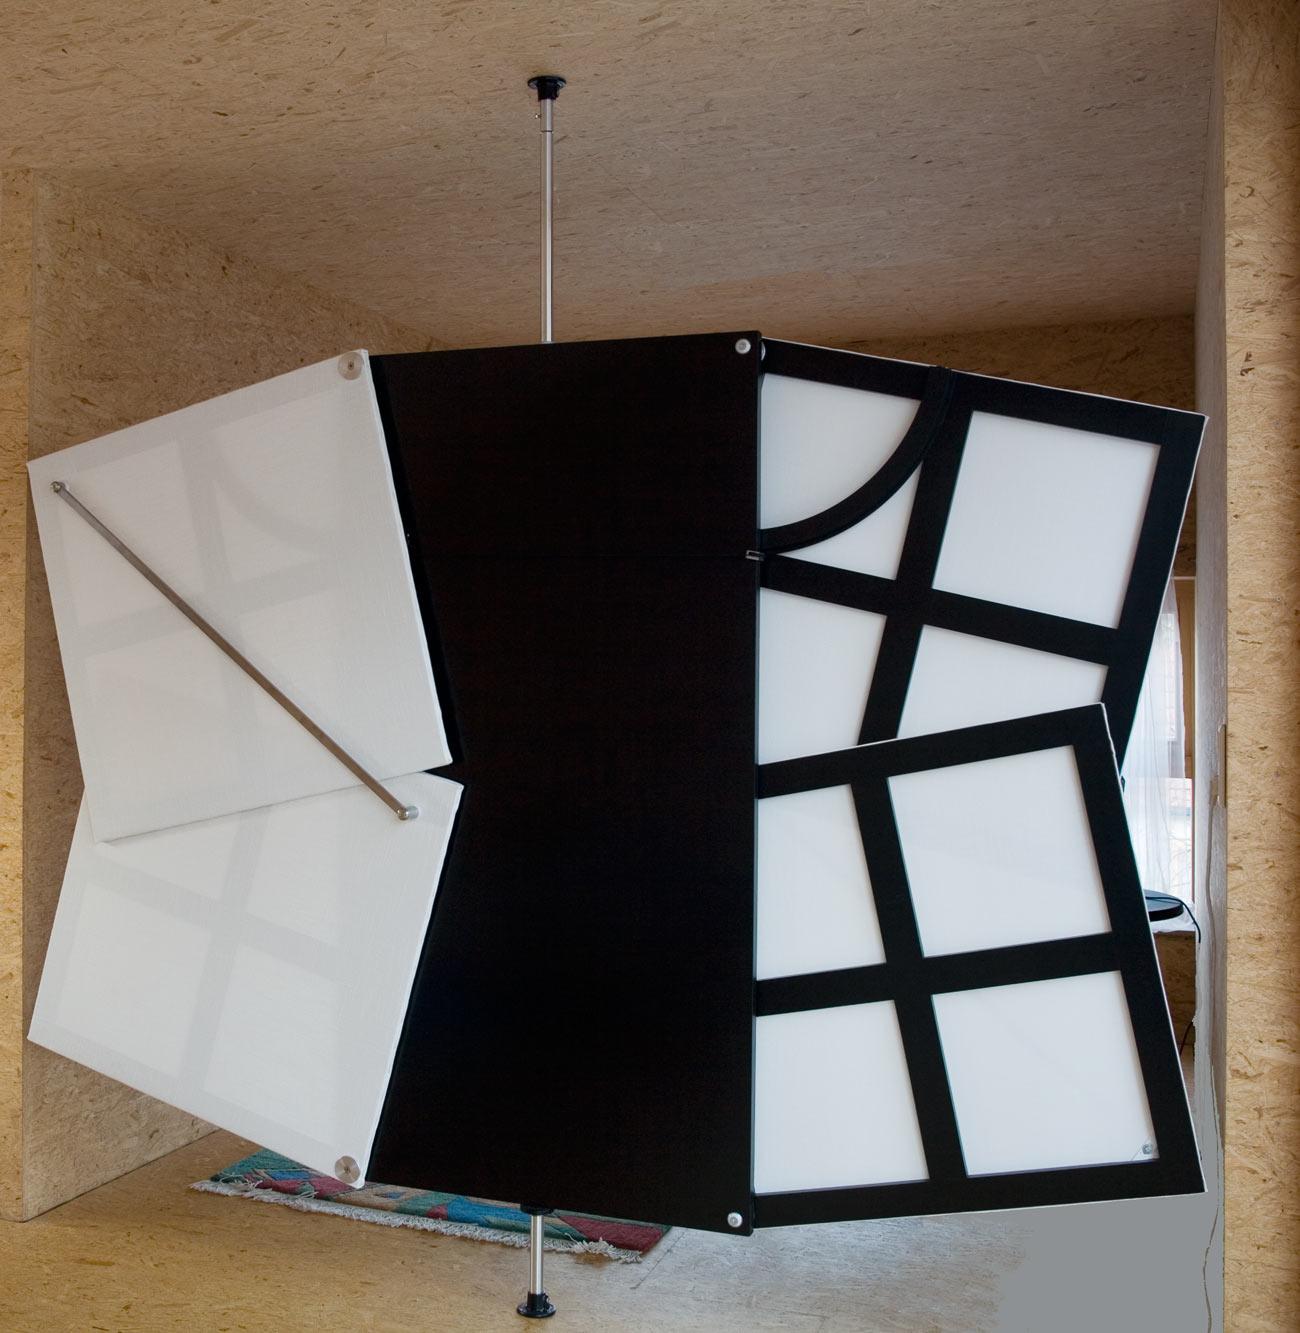 reinventando a porta conhe a a fant stica evolution door. Black Bedroom Furniture Sets. Home Design Ideas